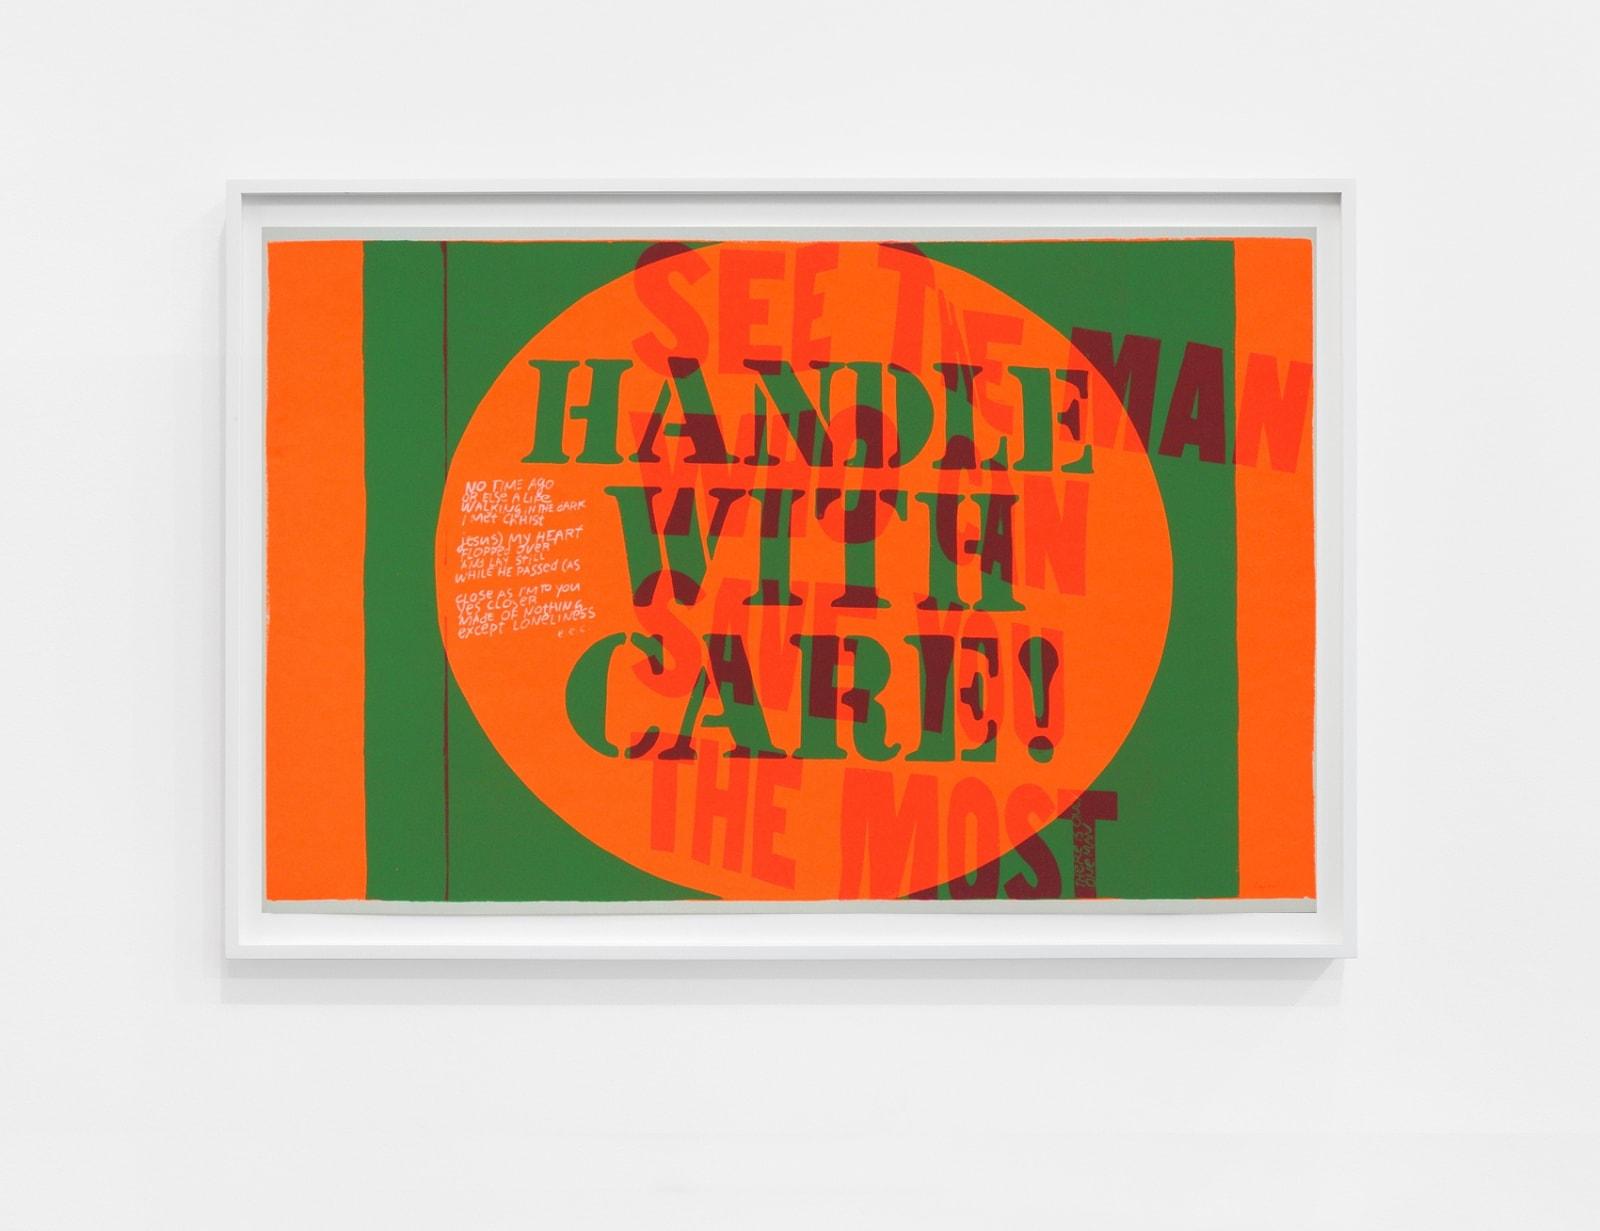 Corita Kent handle with care, 1967 Screenprint 23 x 35 in (58.4 x 88.9 cm) Sold